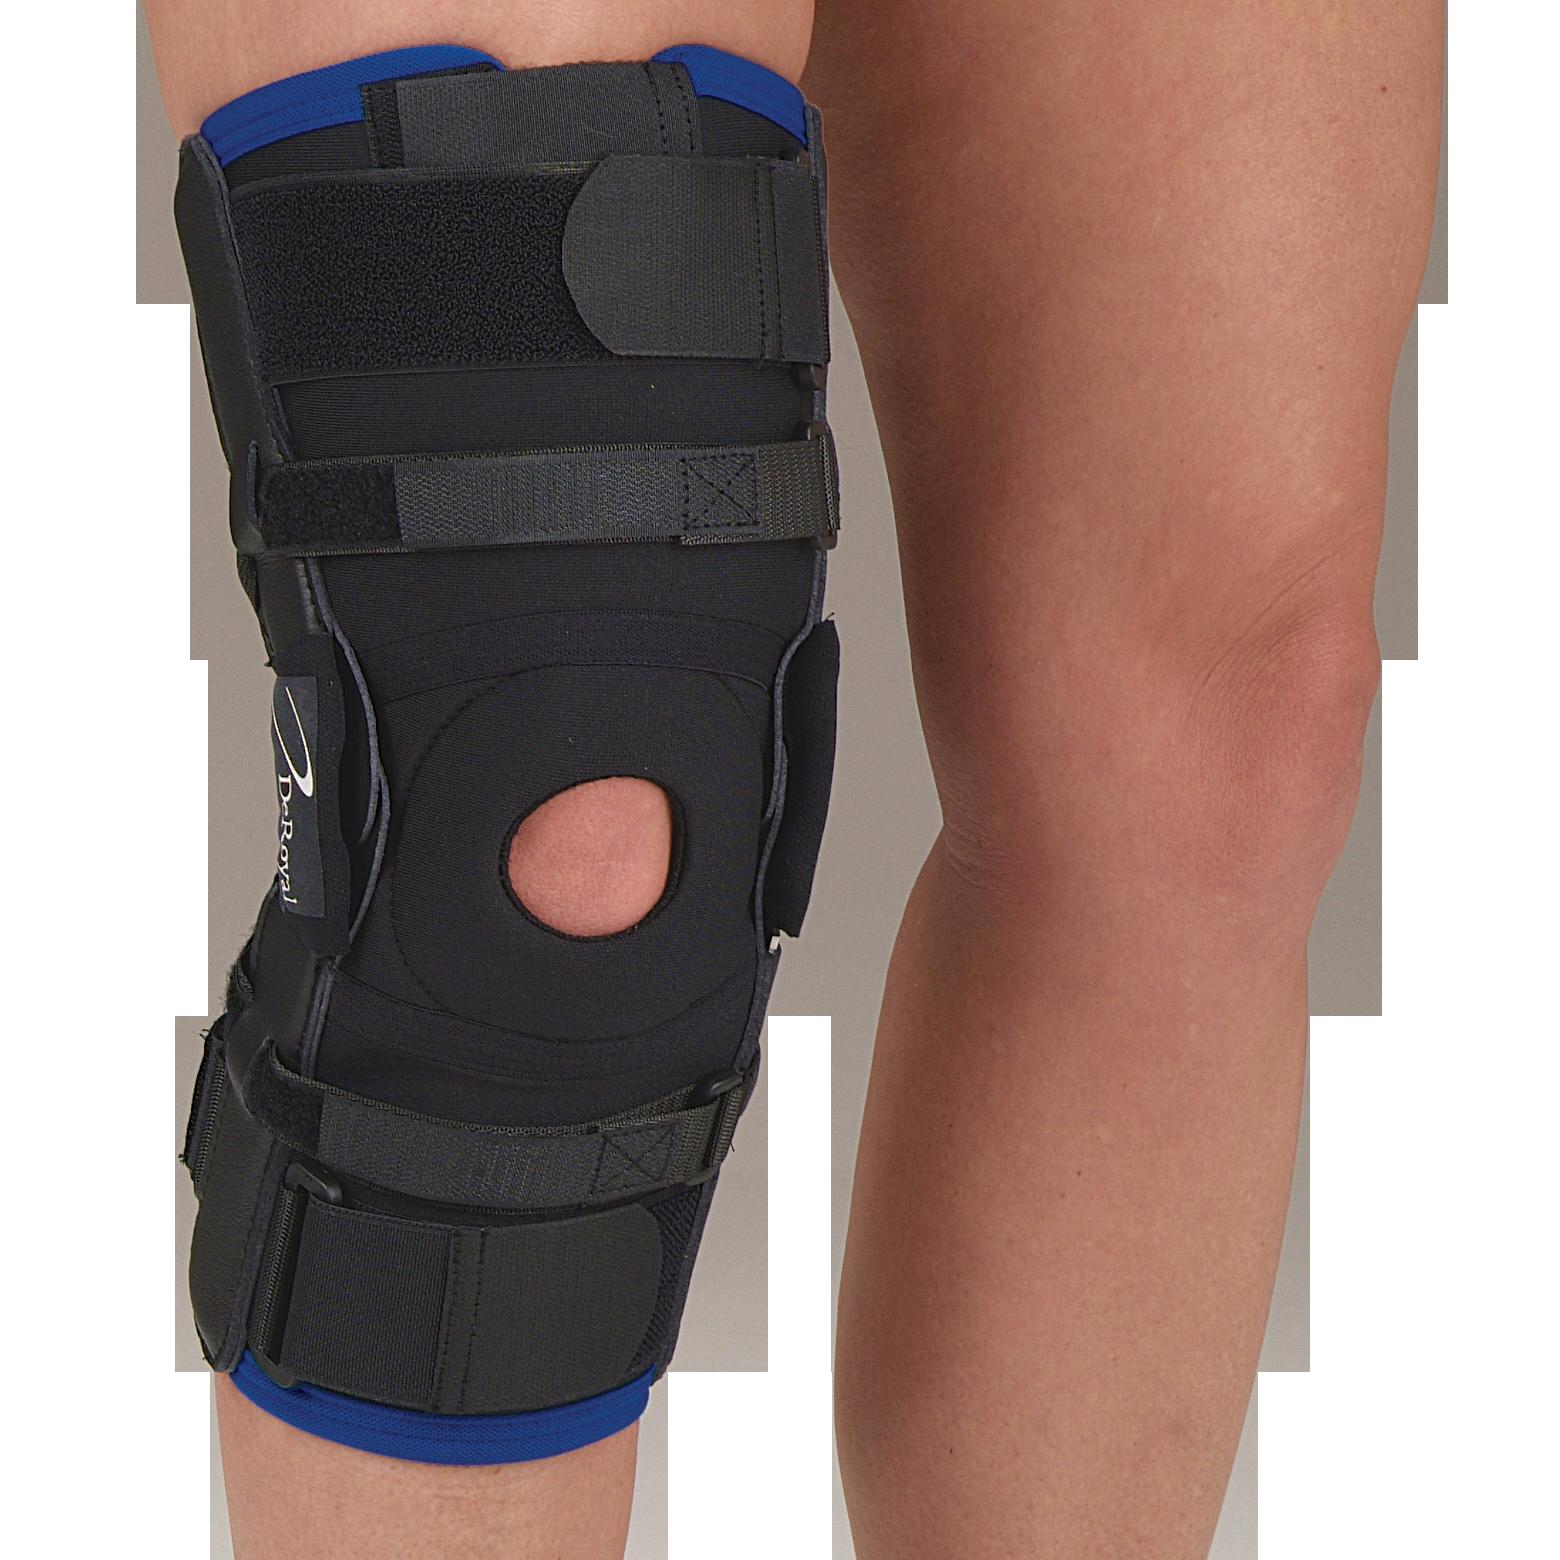 5a5636b467 Hypercontrol® Knee Brace